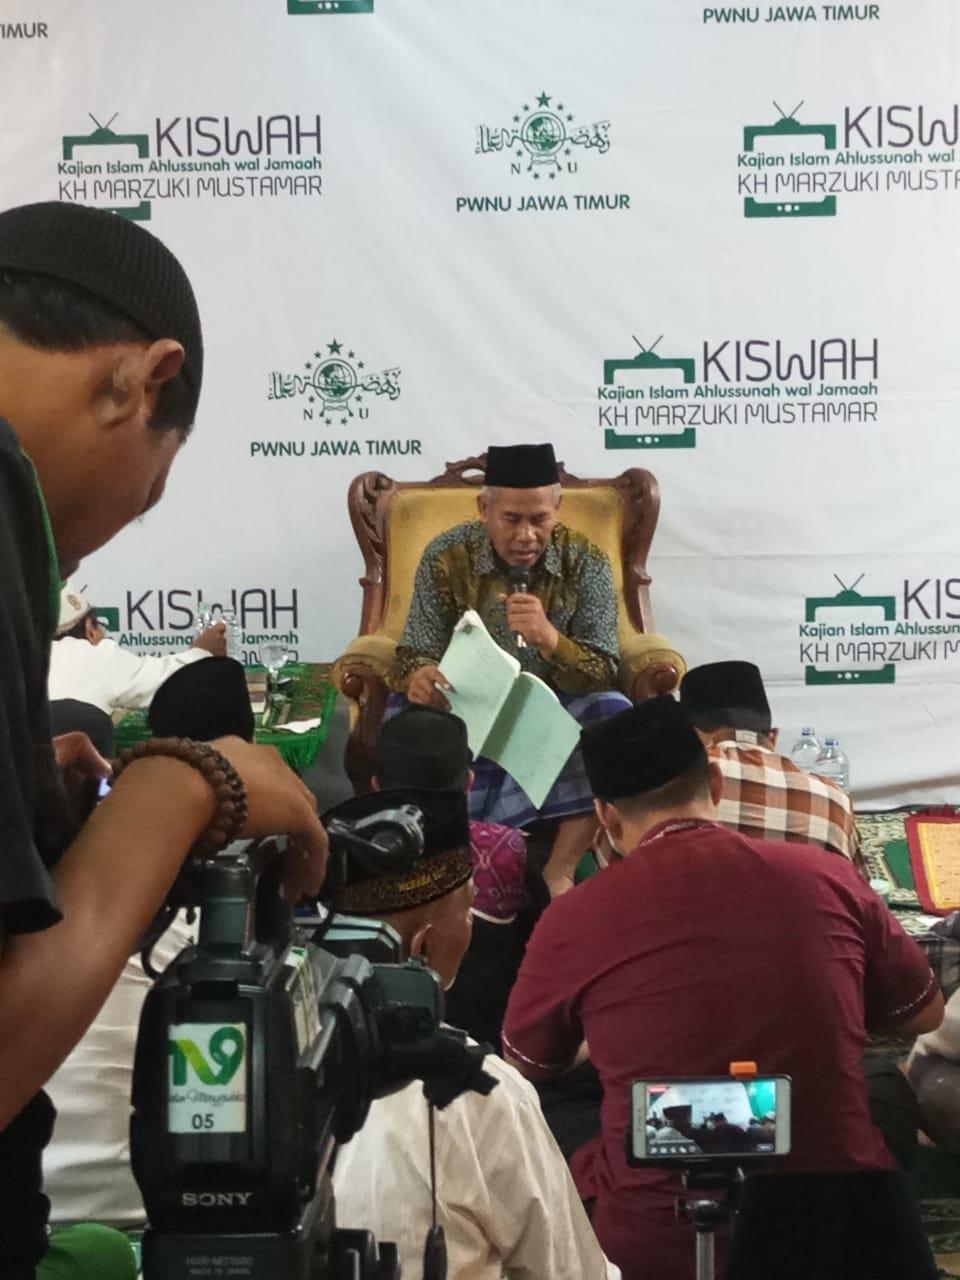 Peduli Derita Sesama di Lombok, Kiai Marzuki: Ini Tolok Ukur Keimanan